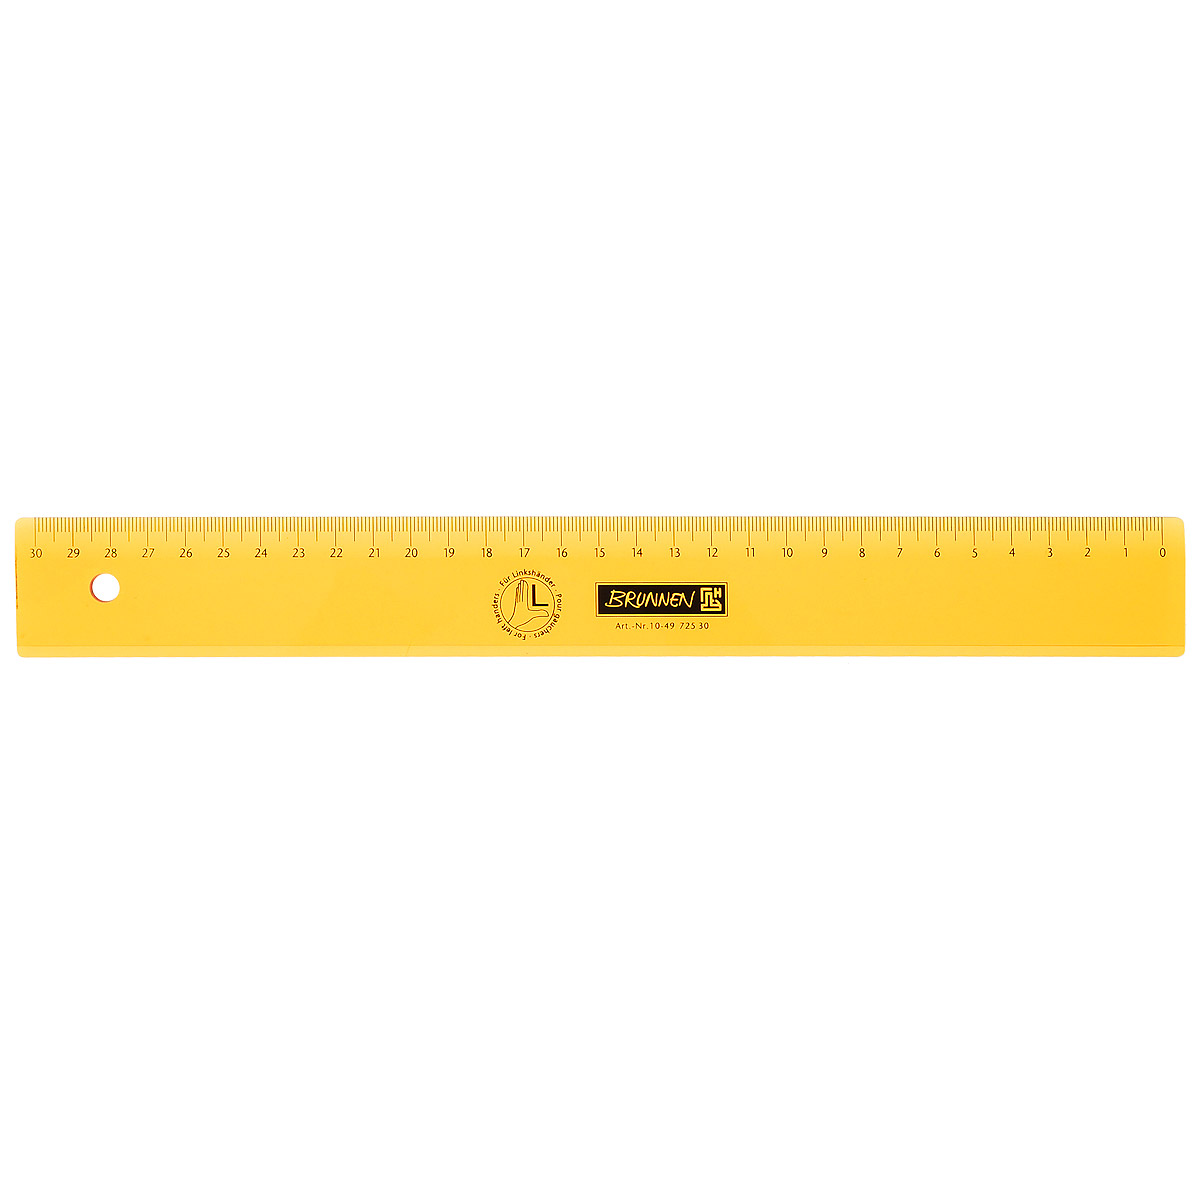 Линейка для левши Brunnen, цвет: желтый, 30 см brunnen линейка для левши цвет красный 17 см